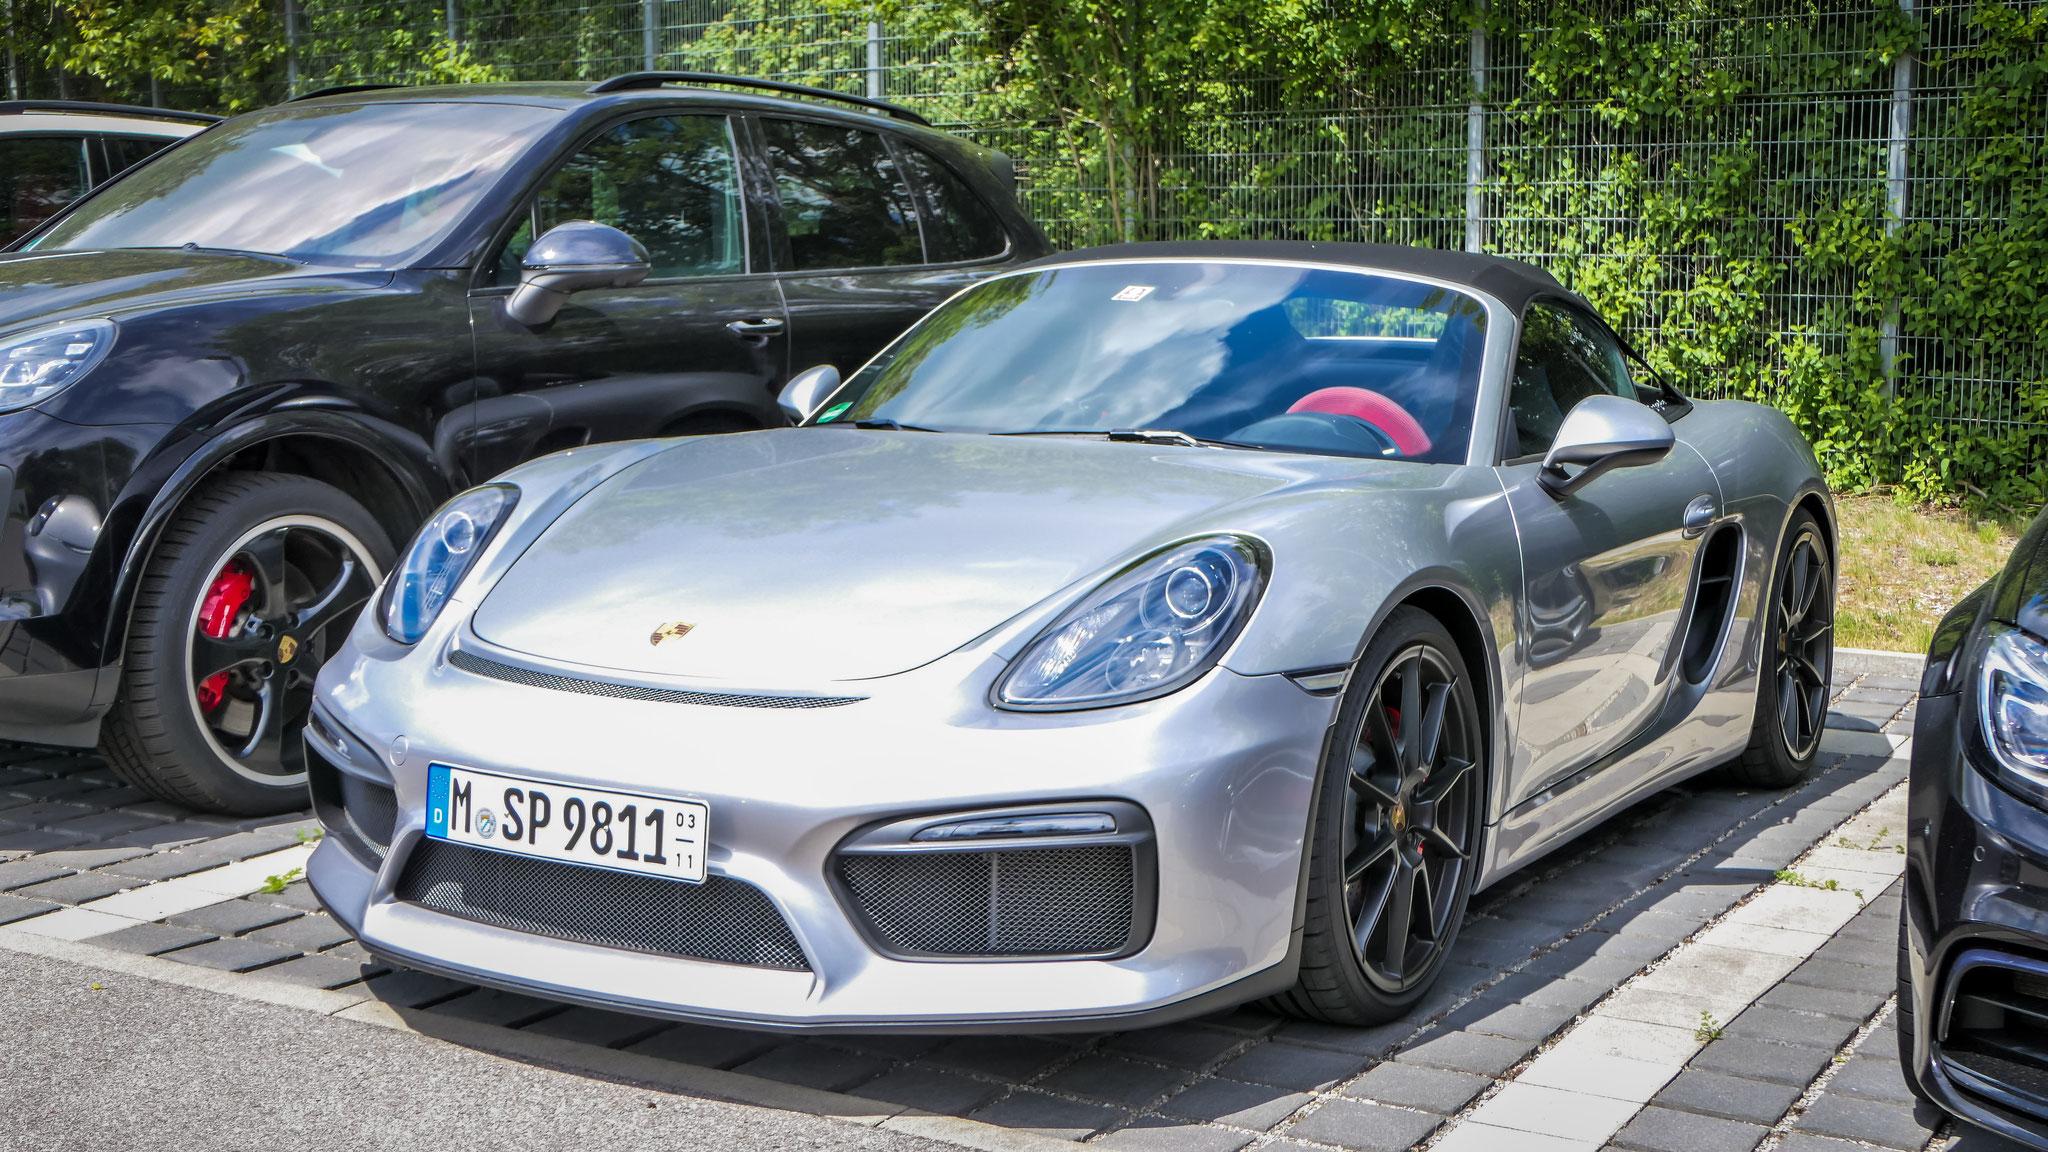 Porsche 718 Spyder - M-SP-9811